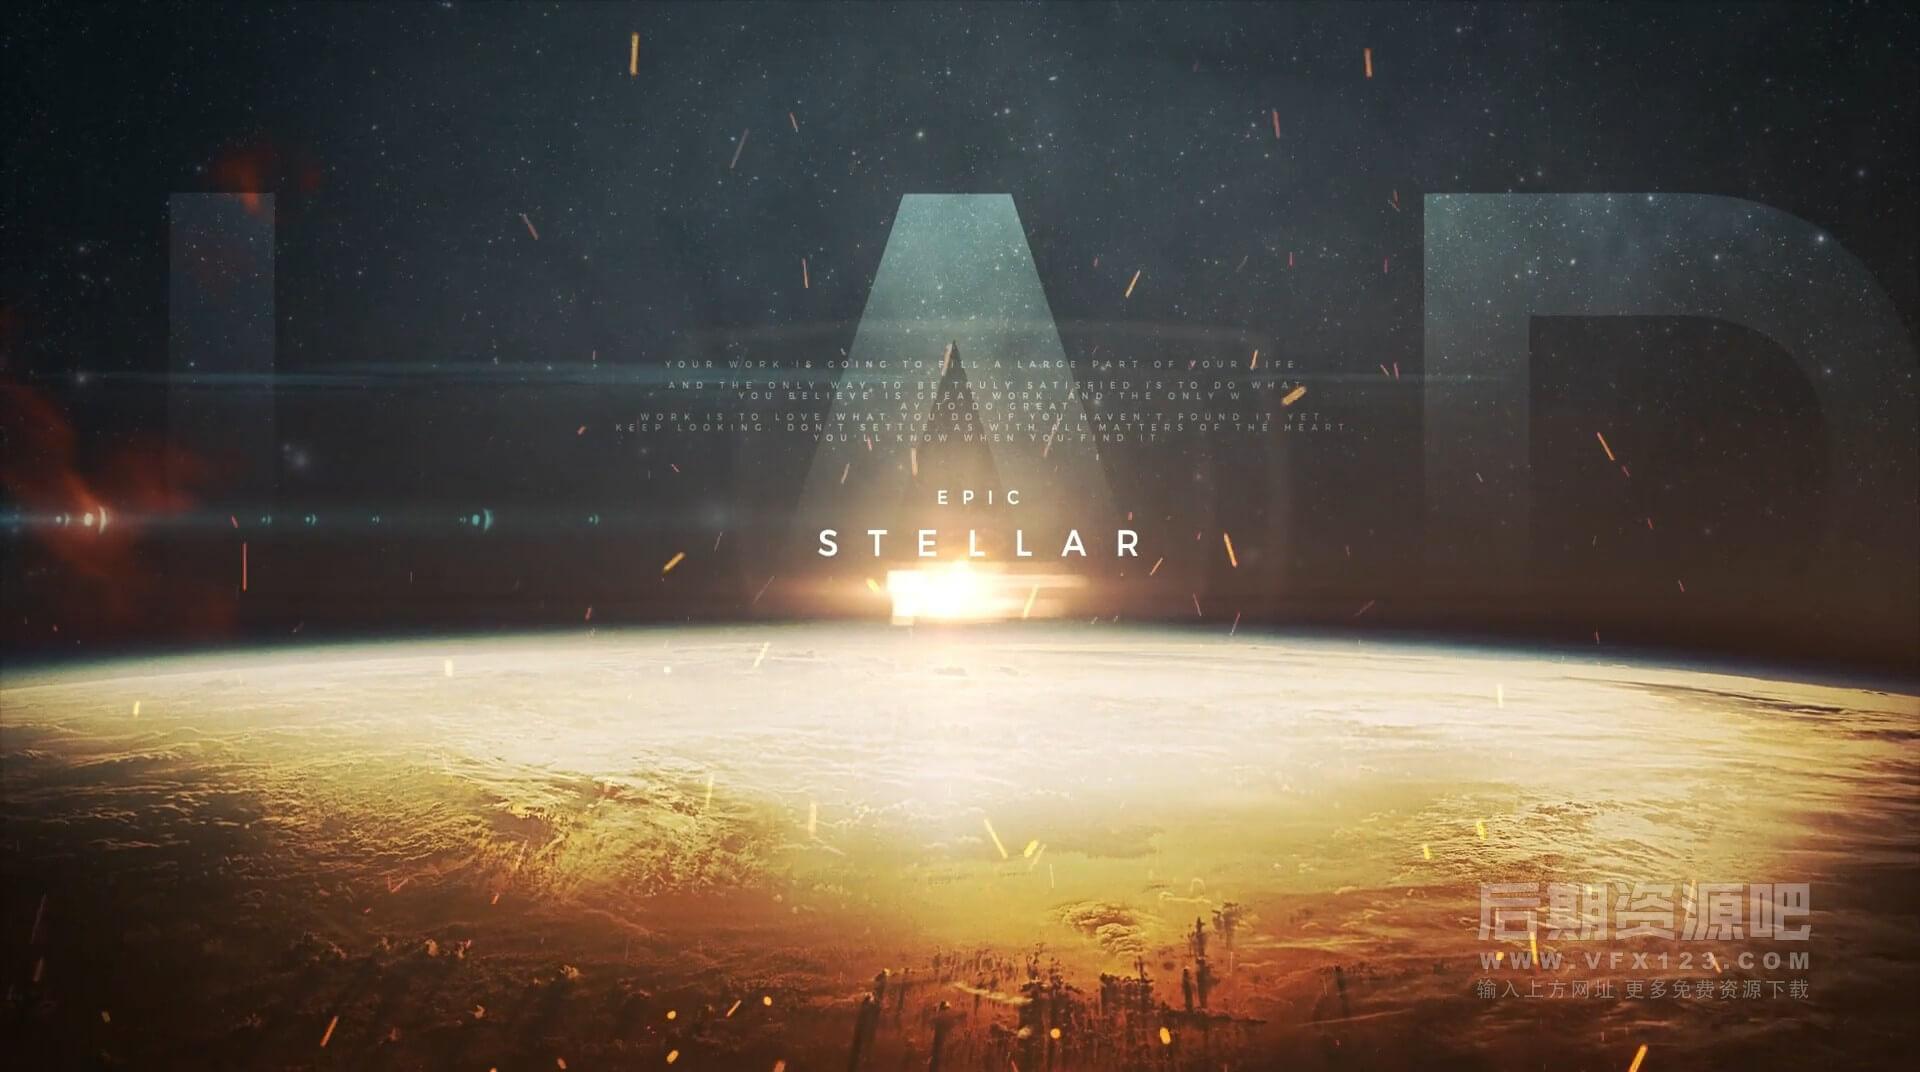 Fcpx插件 4K震撼史诗巨制粒子飞散特效电影预告片模板 Space Trailer